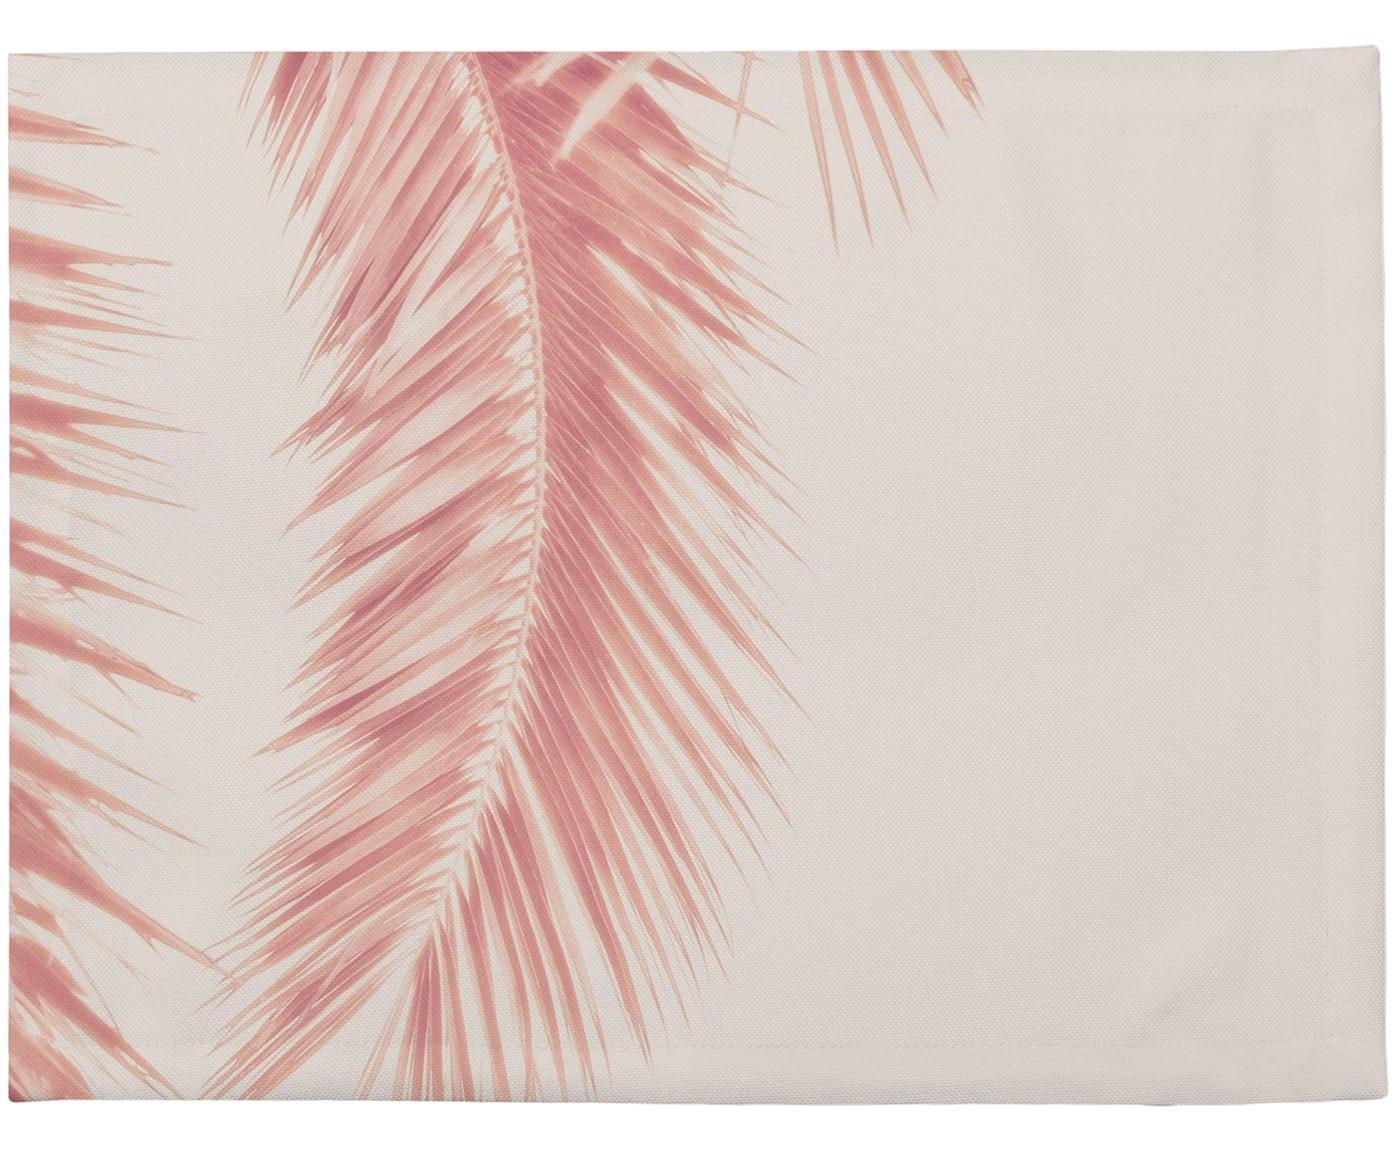 Tischsets Palm Leaves, 4 Stück, Polyester, Rosatöne, 35 x 45 cm